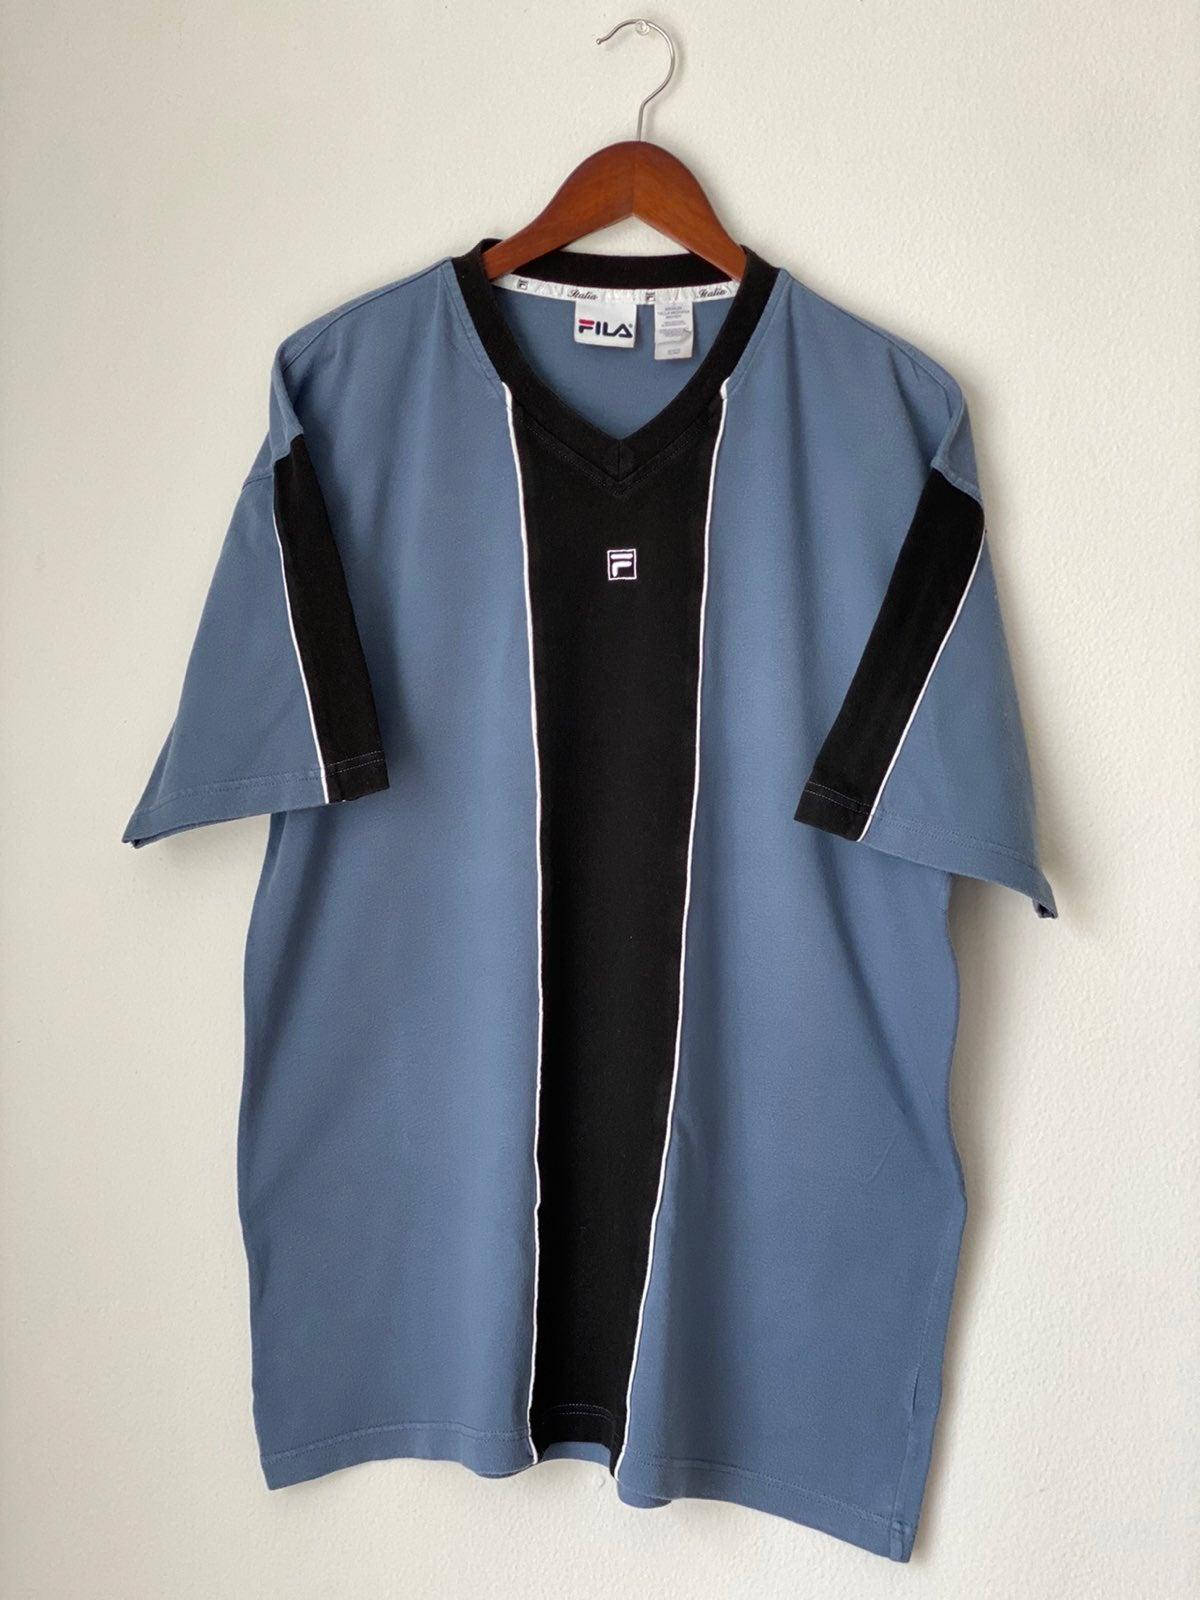 Vtg 90s Fila Shirt Sz M